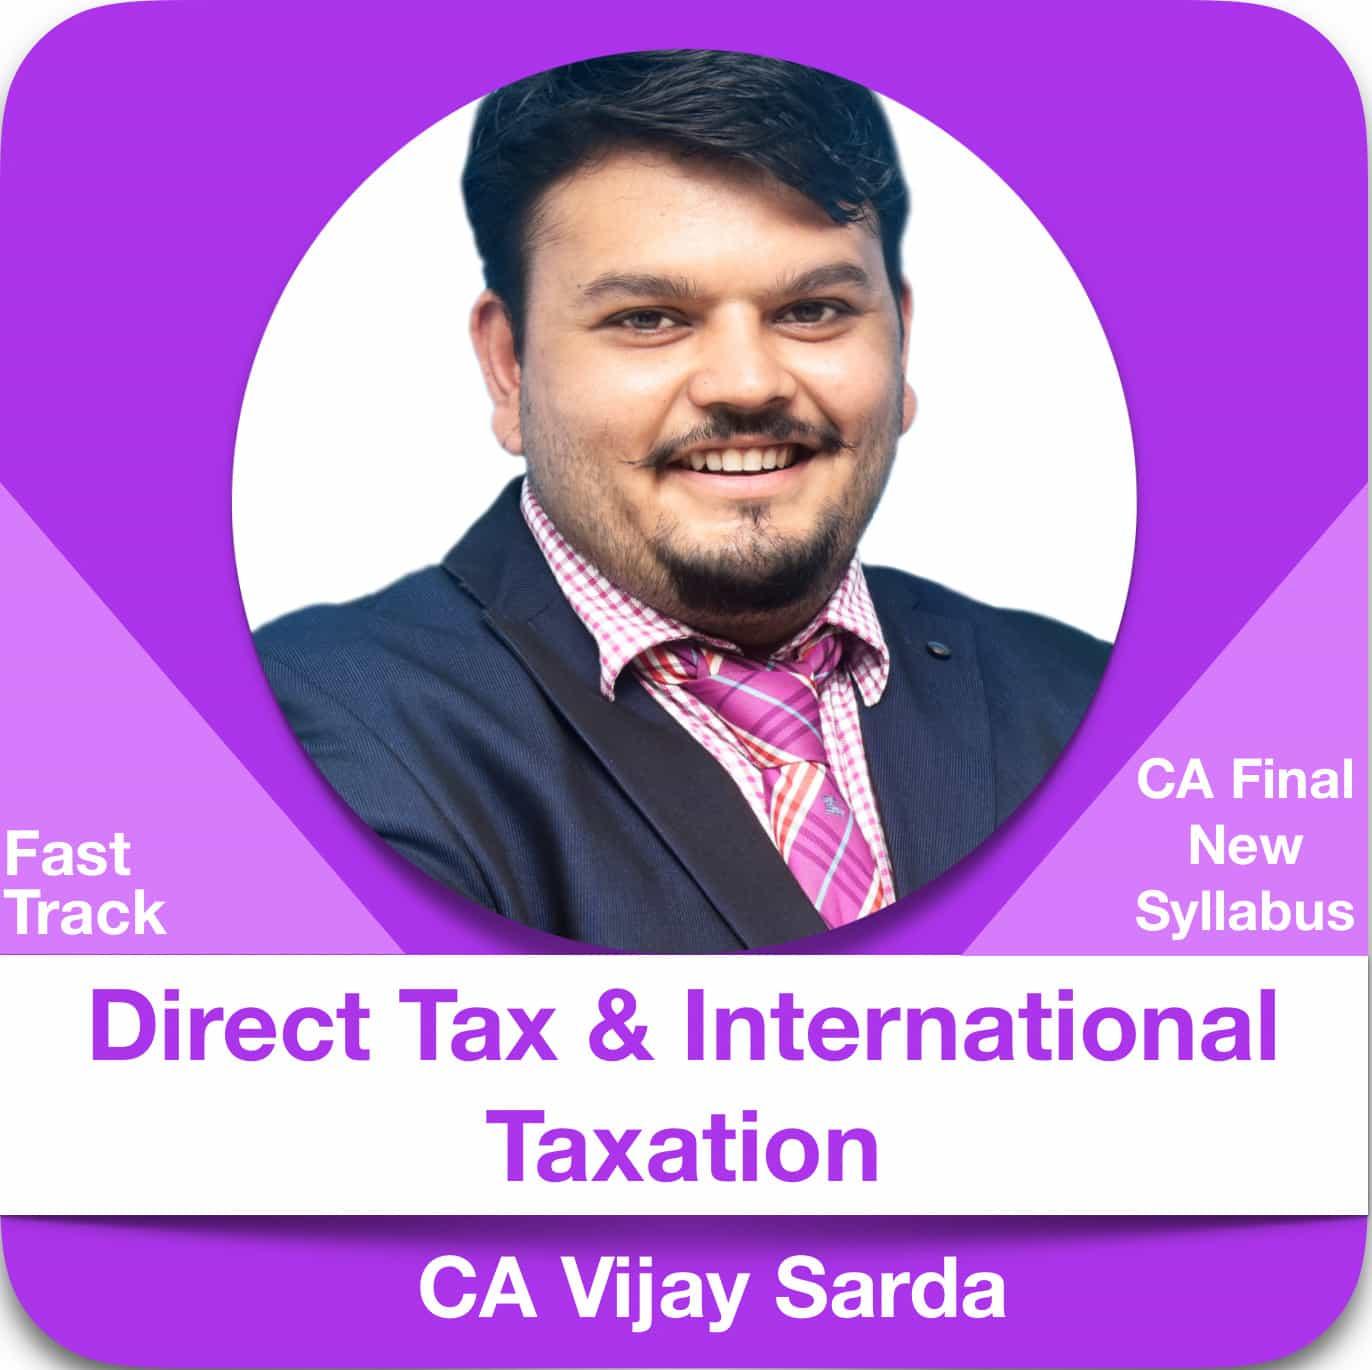 Direct Tax (Super 35) Fast Track Batch (May 21 & Nov 21 )